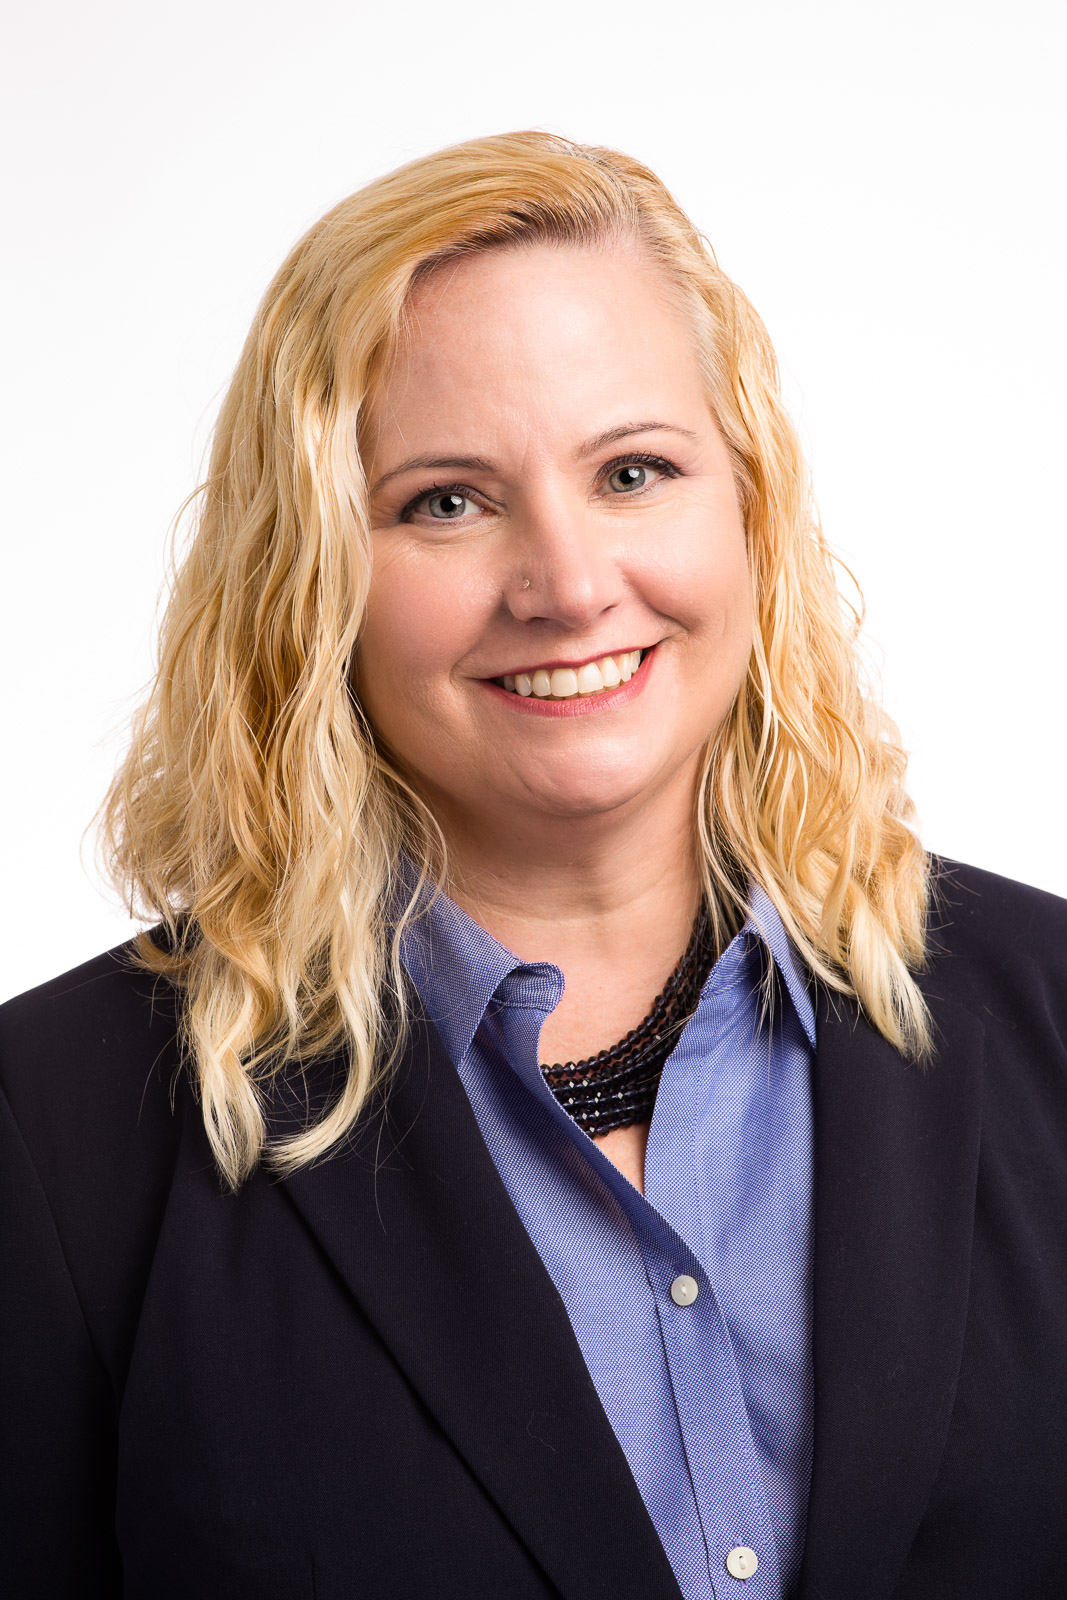 JESSICA G. HITCHCOCK, MD